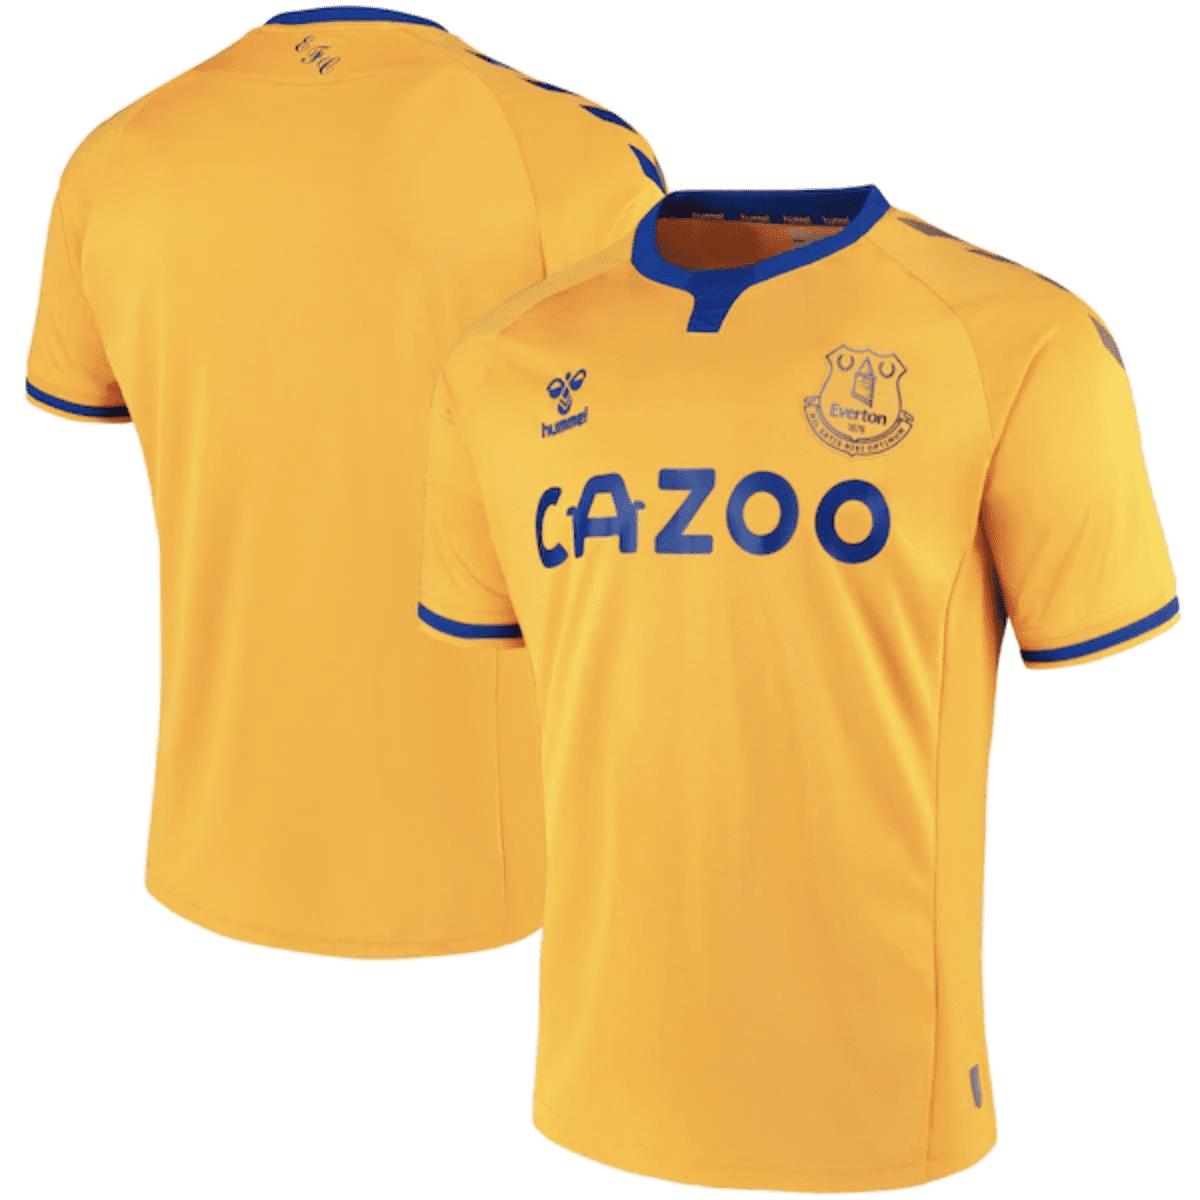 Everton-away-kit-2020-2021 | Ama la Maglia